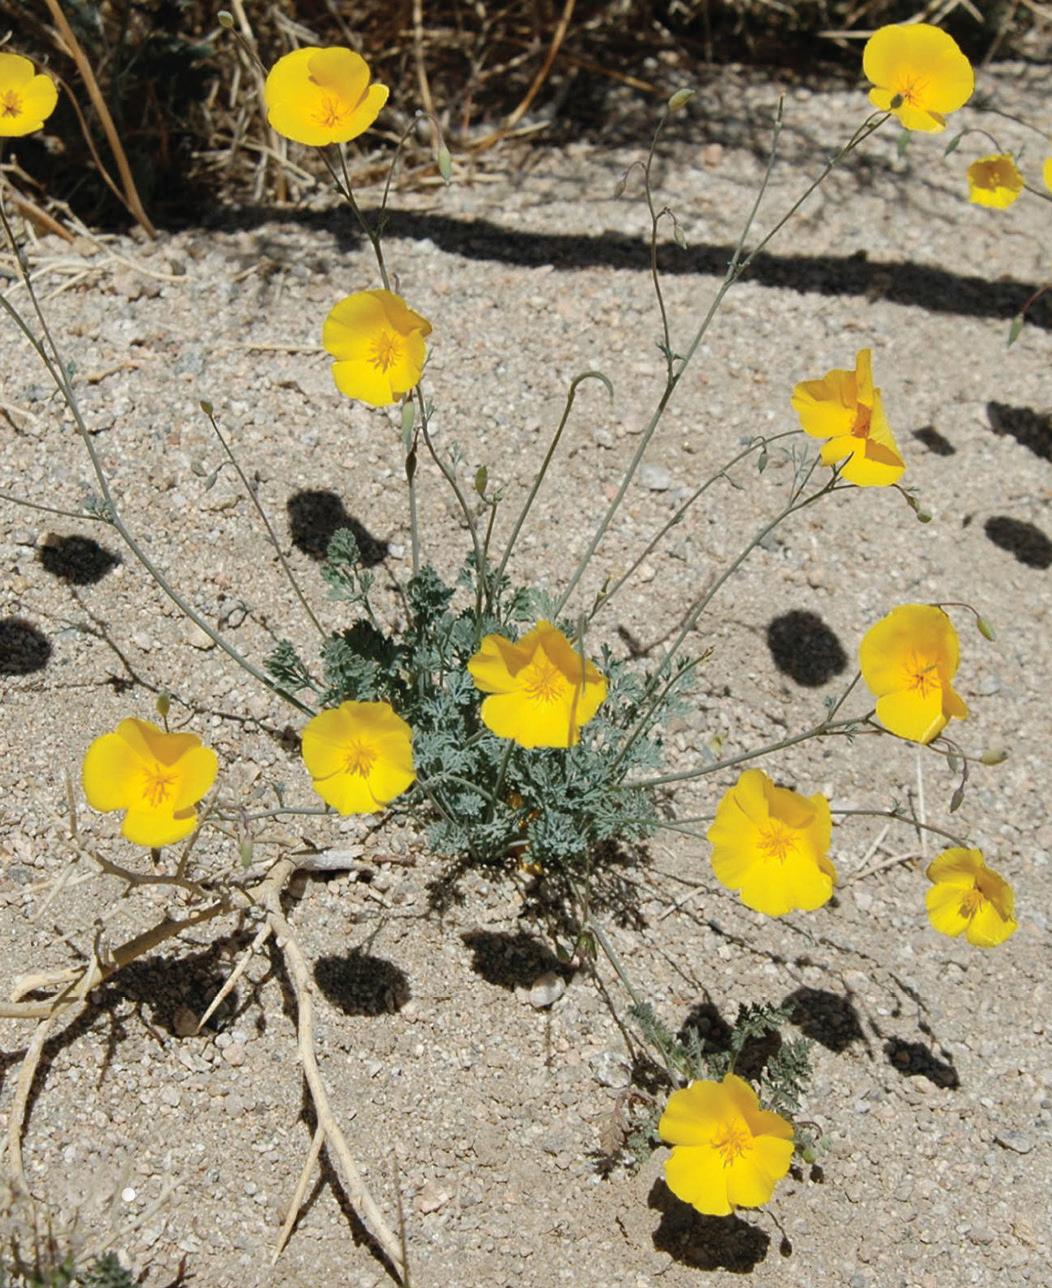 California And Arizona Amaze With Two New Species Of Desert Poppy